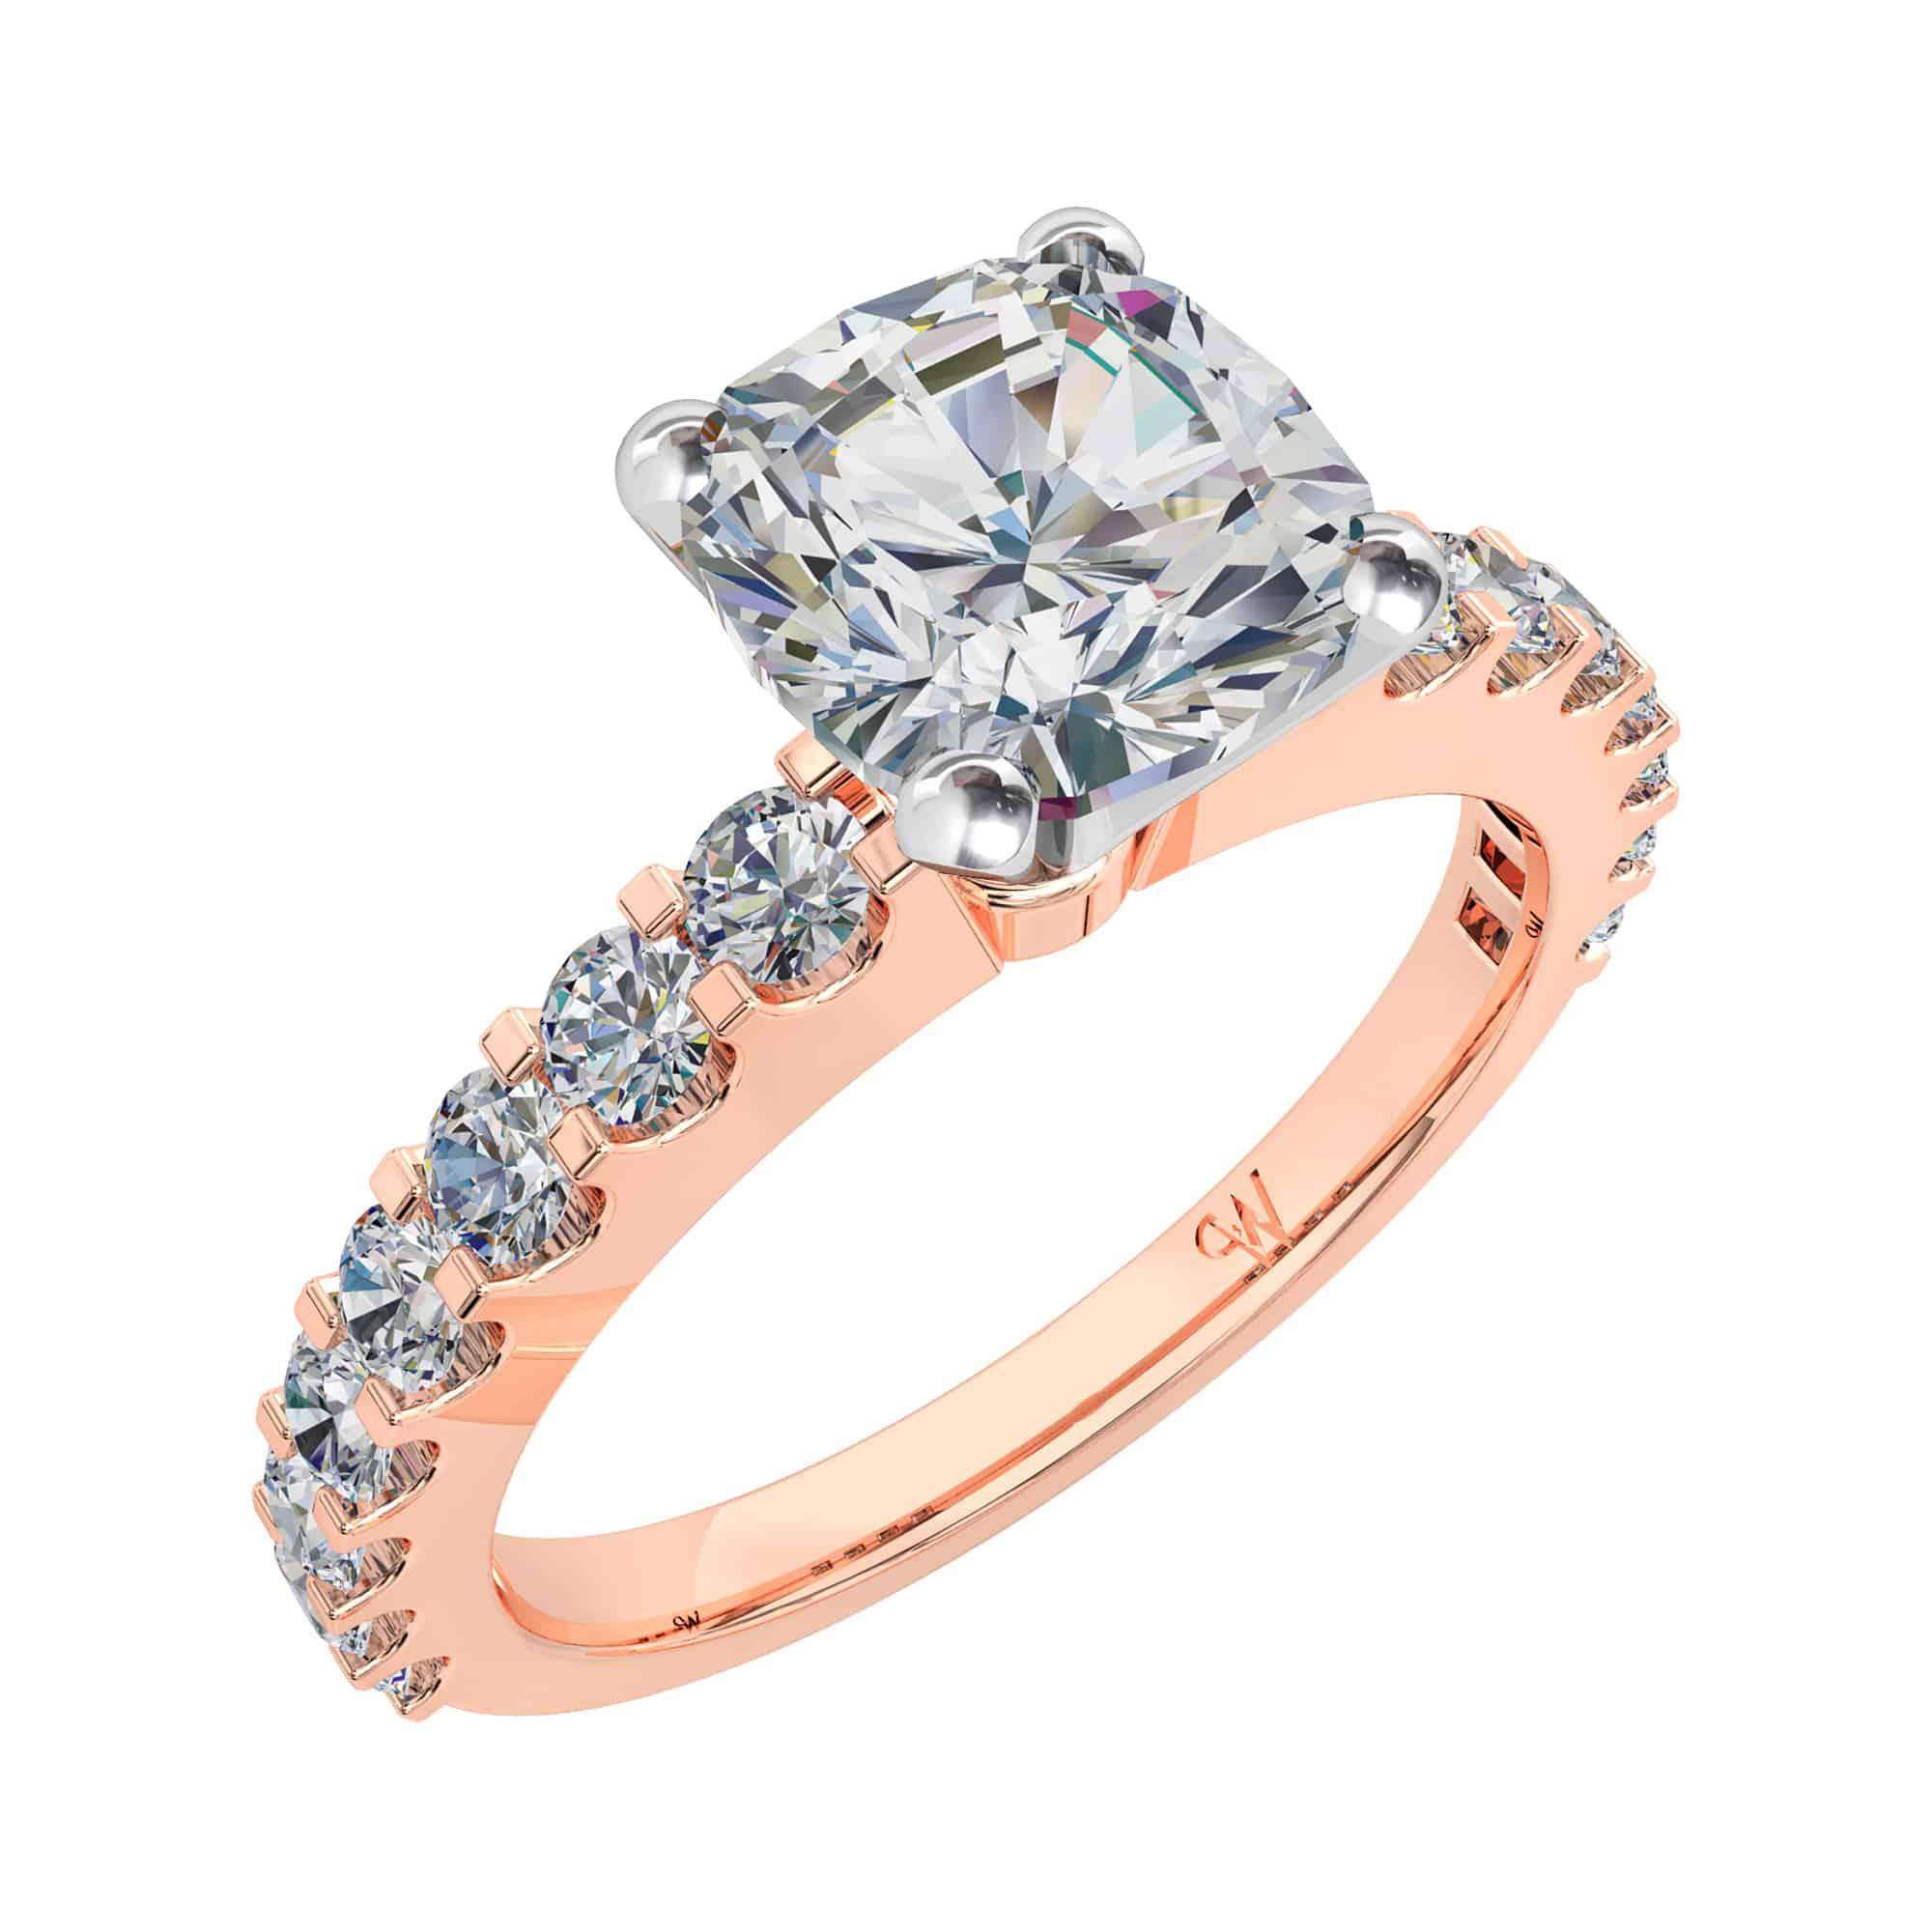 Cushion Cut Diamond Solitaire Engagement Ring